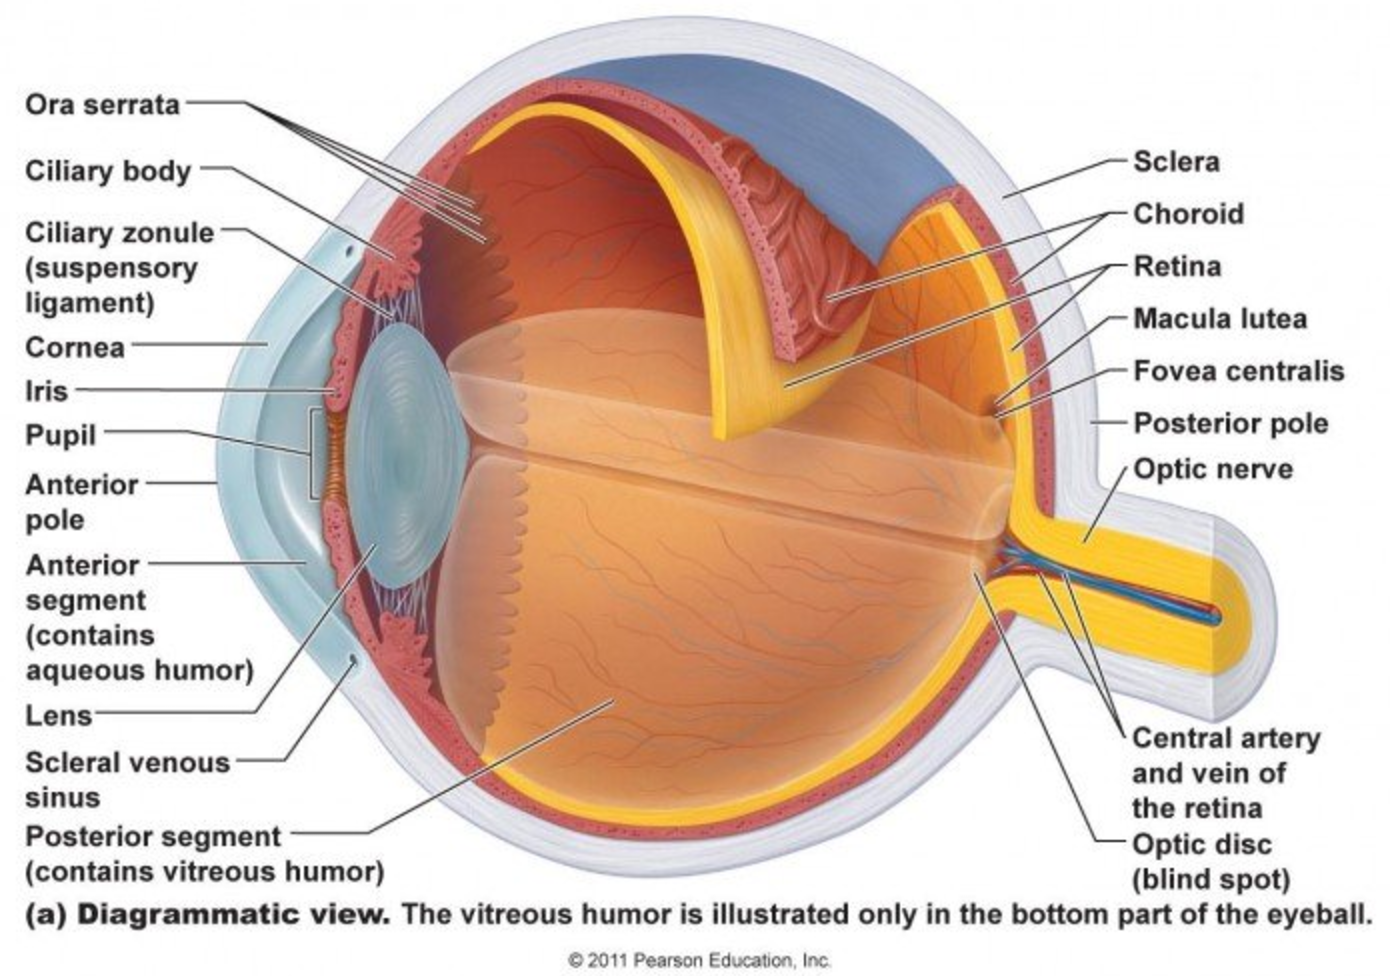 Ocular Anatomy and Function Lab 2/7 (Eye lab) Flashcards | Memorang